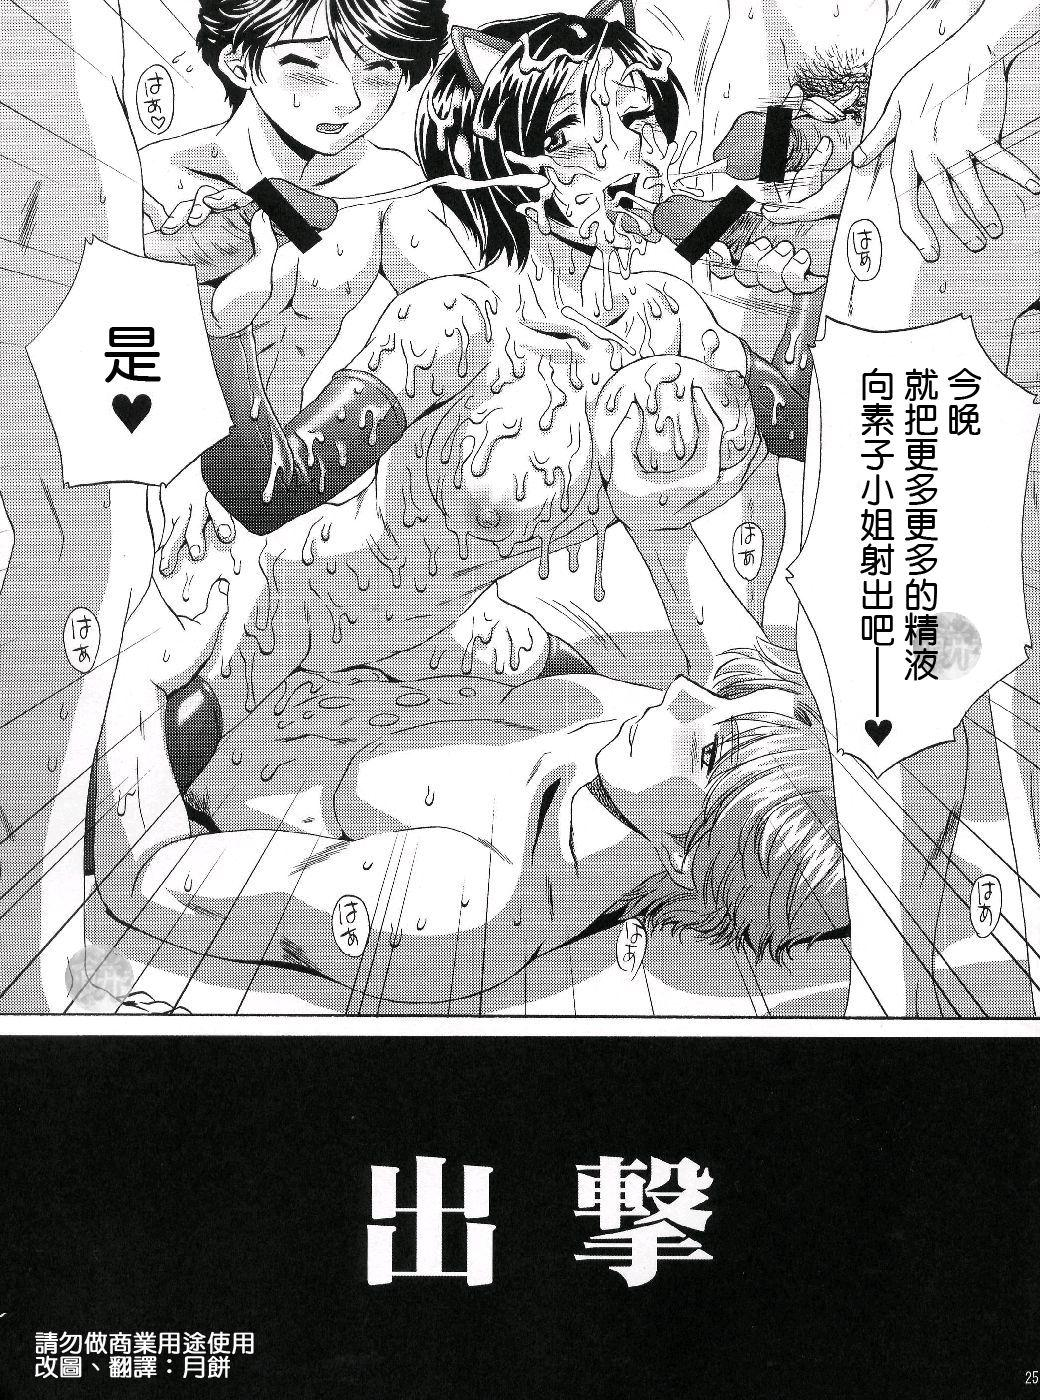 Hakudakueki Gensou Gang Bang March 23